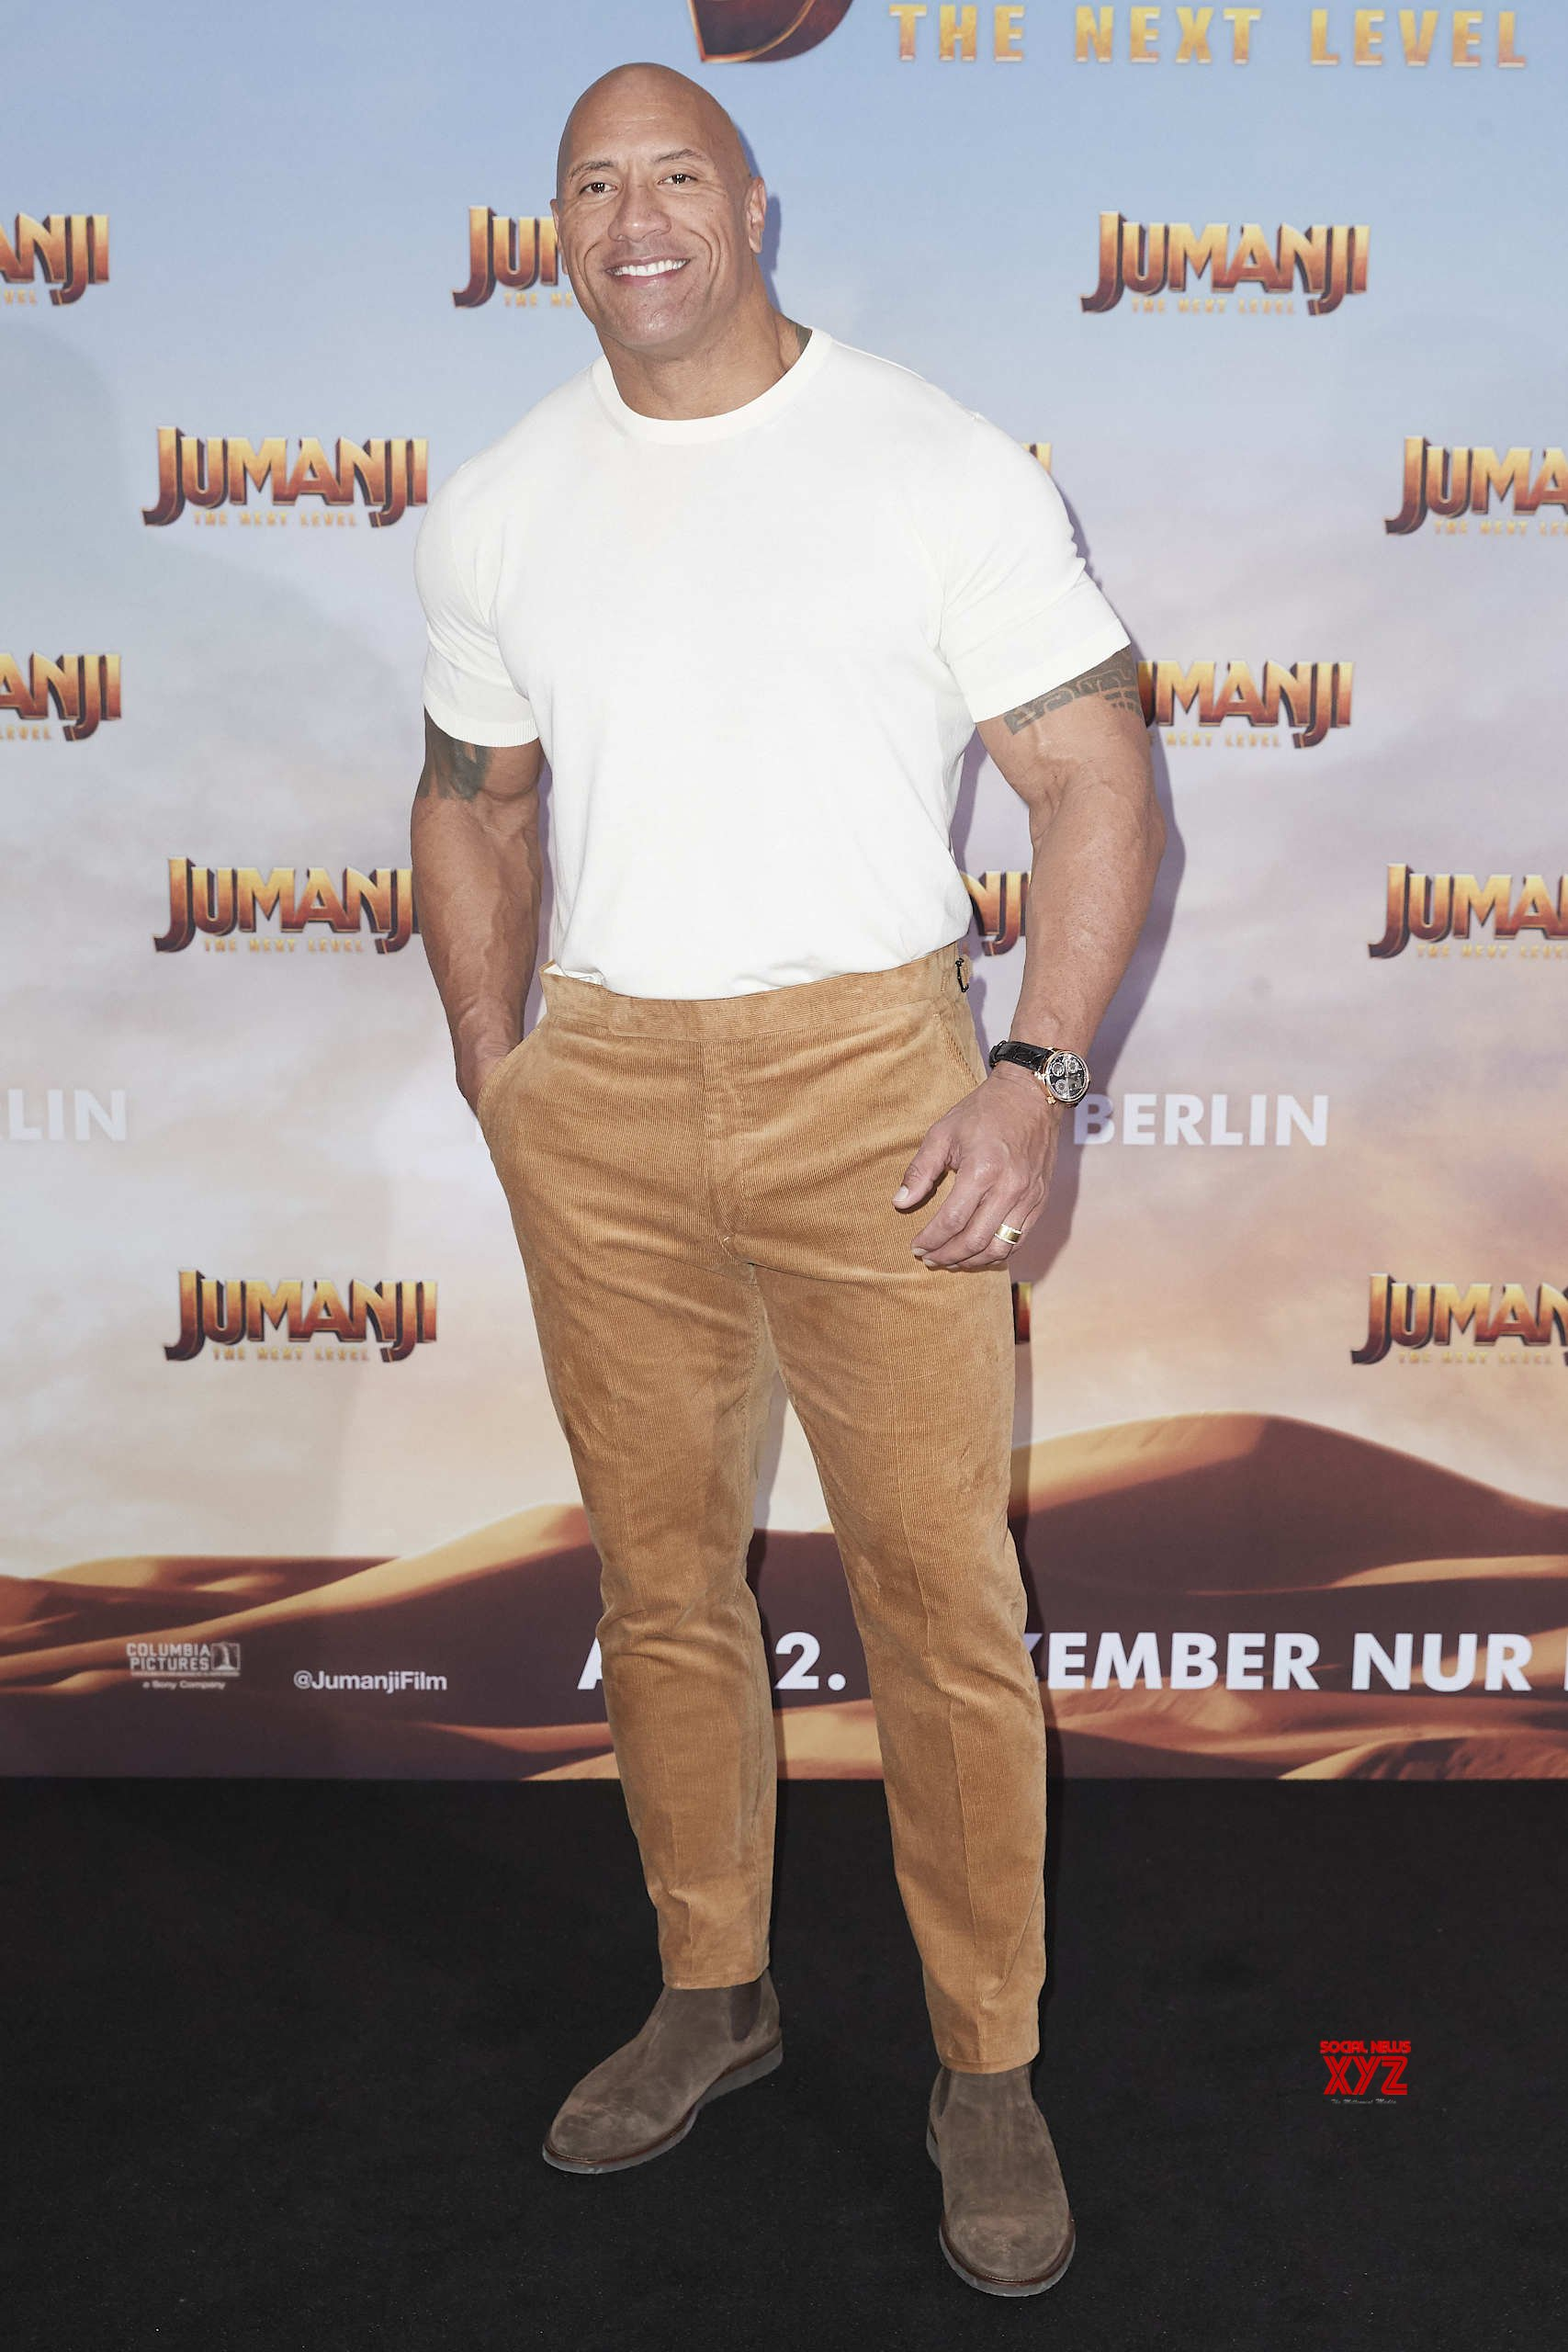 Jumanji: The Next Level Movie Berlin Photo Call HD Gallery